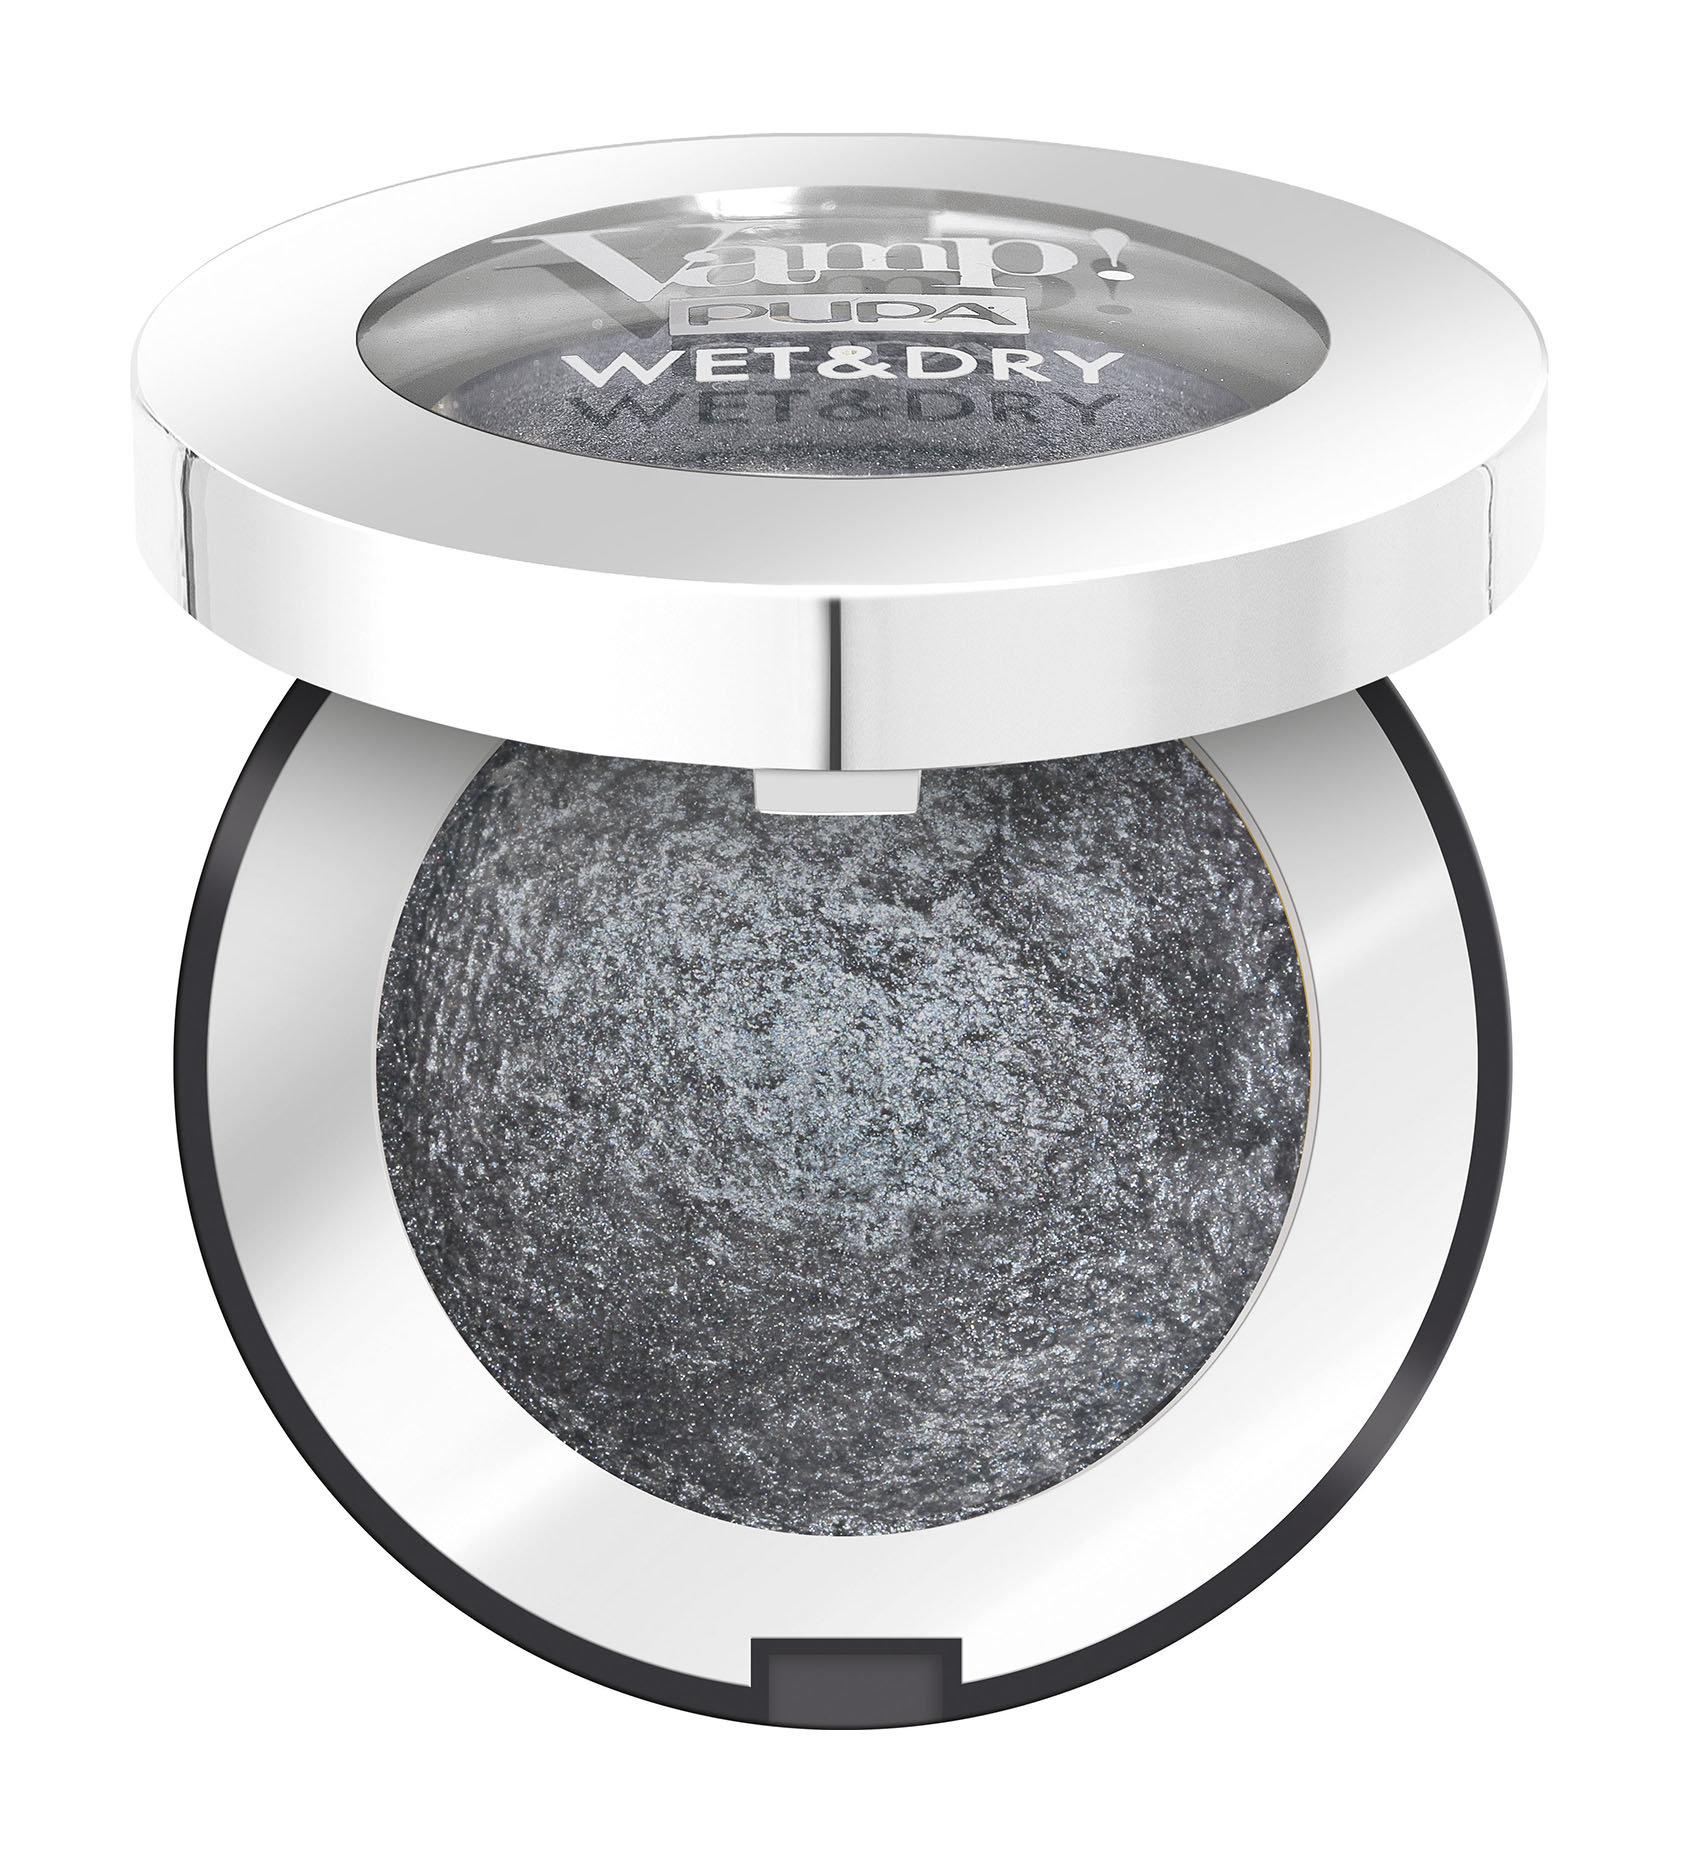 Купить Тени Pupa Vamp! Wet&Dry Eyeshadow 305 Anthracite Grey